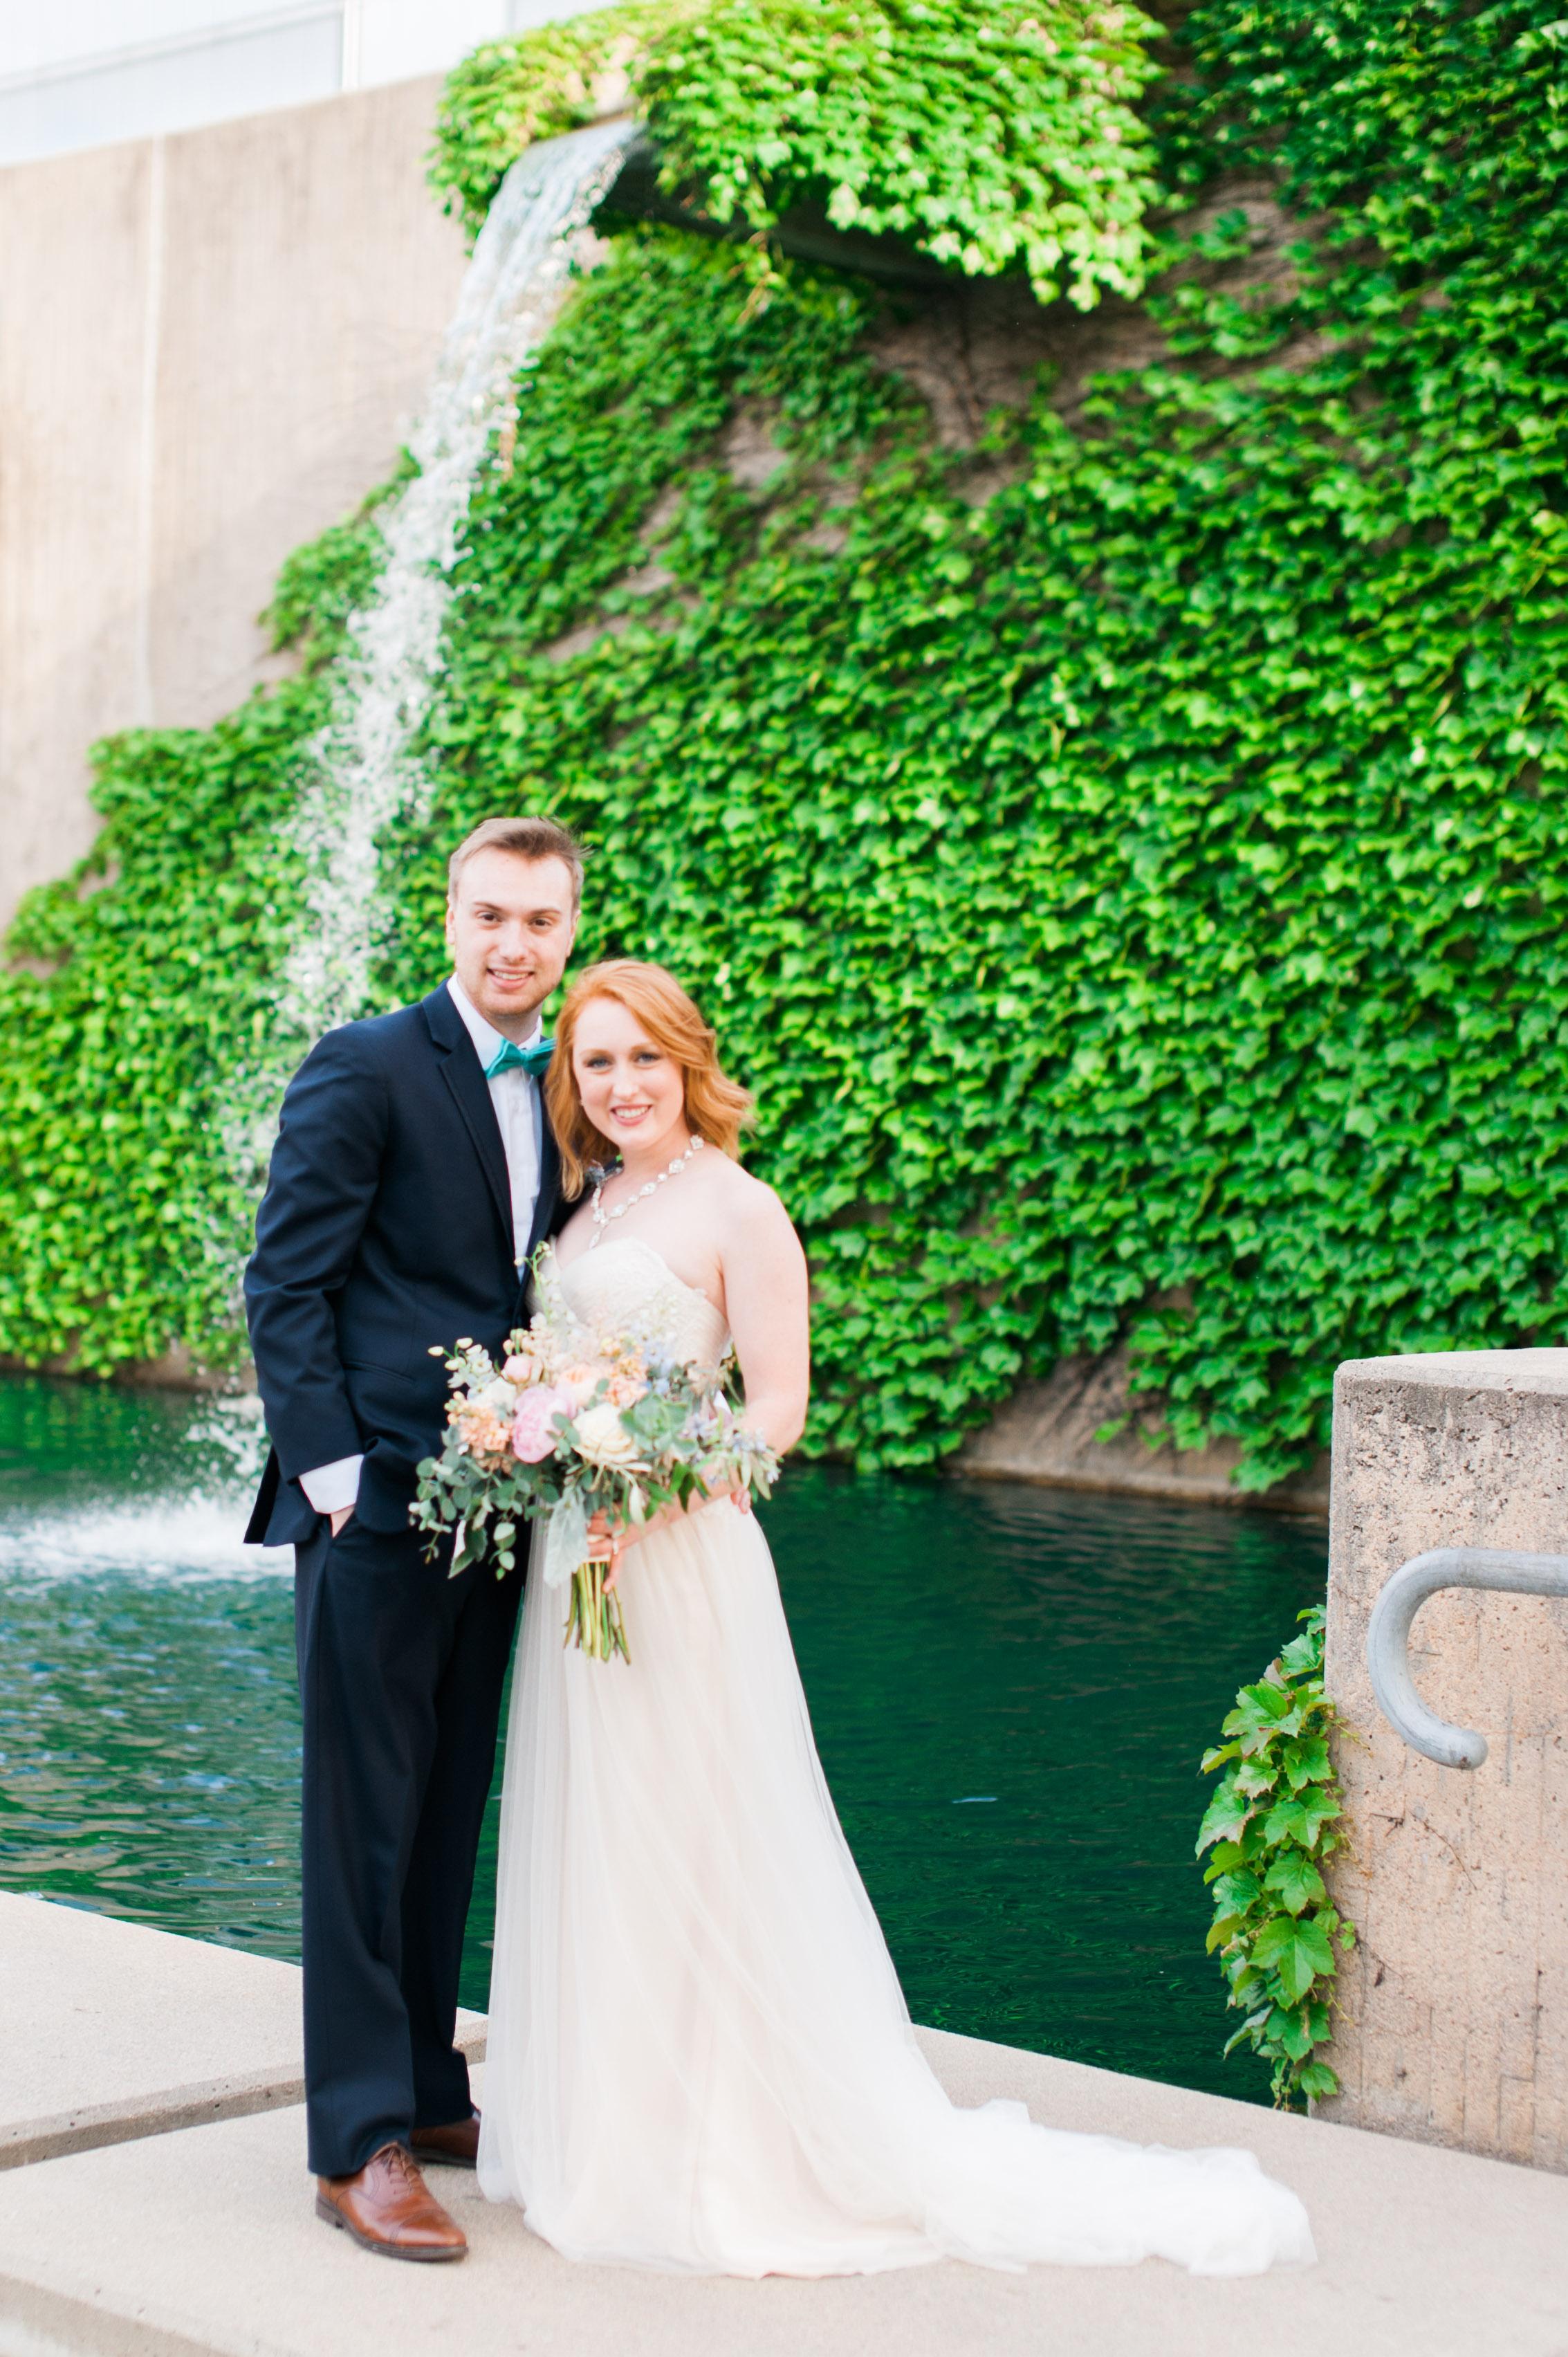 omaha-holland-arts-center-wedding-72.jpg